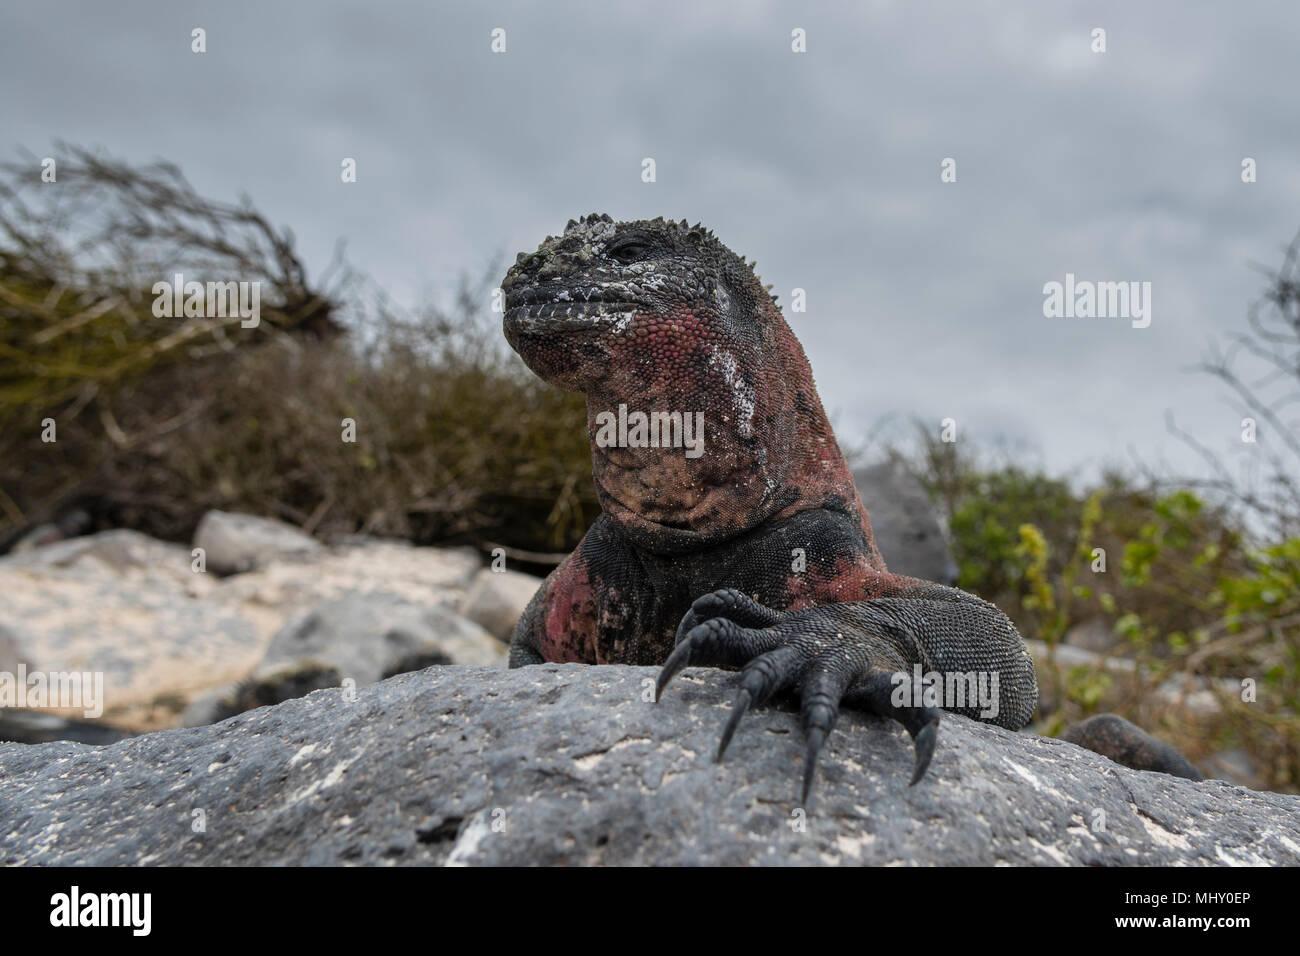 Iguana marina (Amblyrhynchus cristatus) sulle rocce costiere, Punta Suarez, all'Isola Espanola, Isole Galapagos, Ecuador Immagini Stock